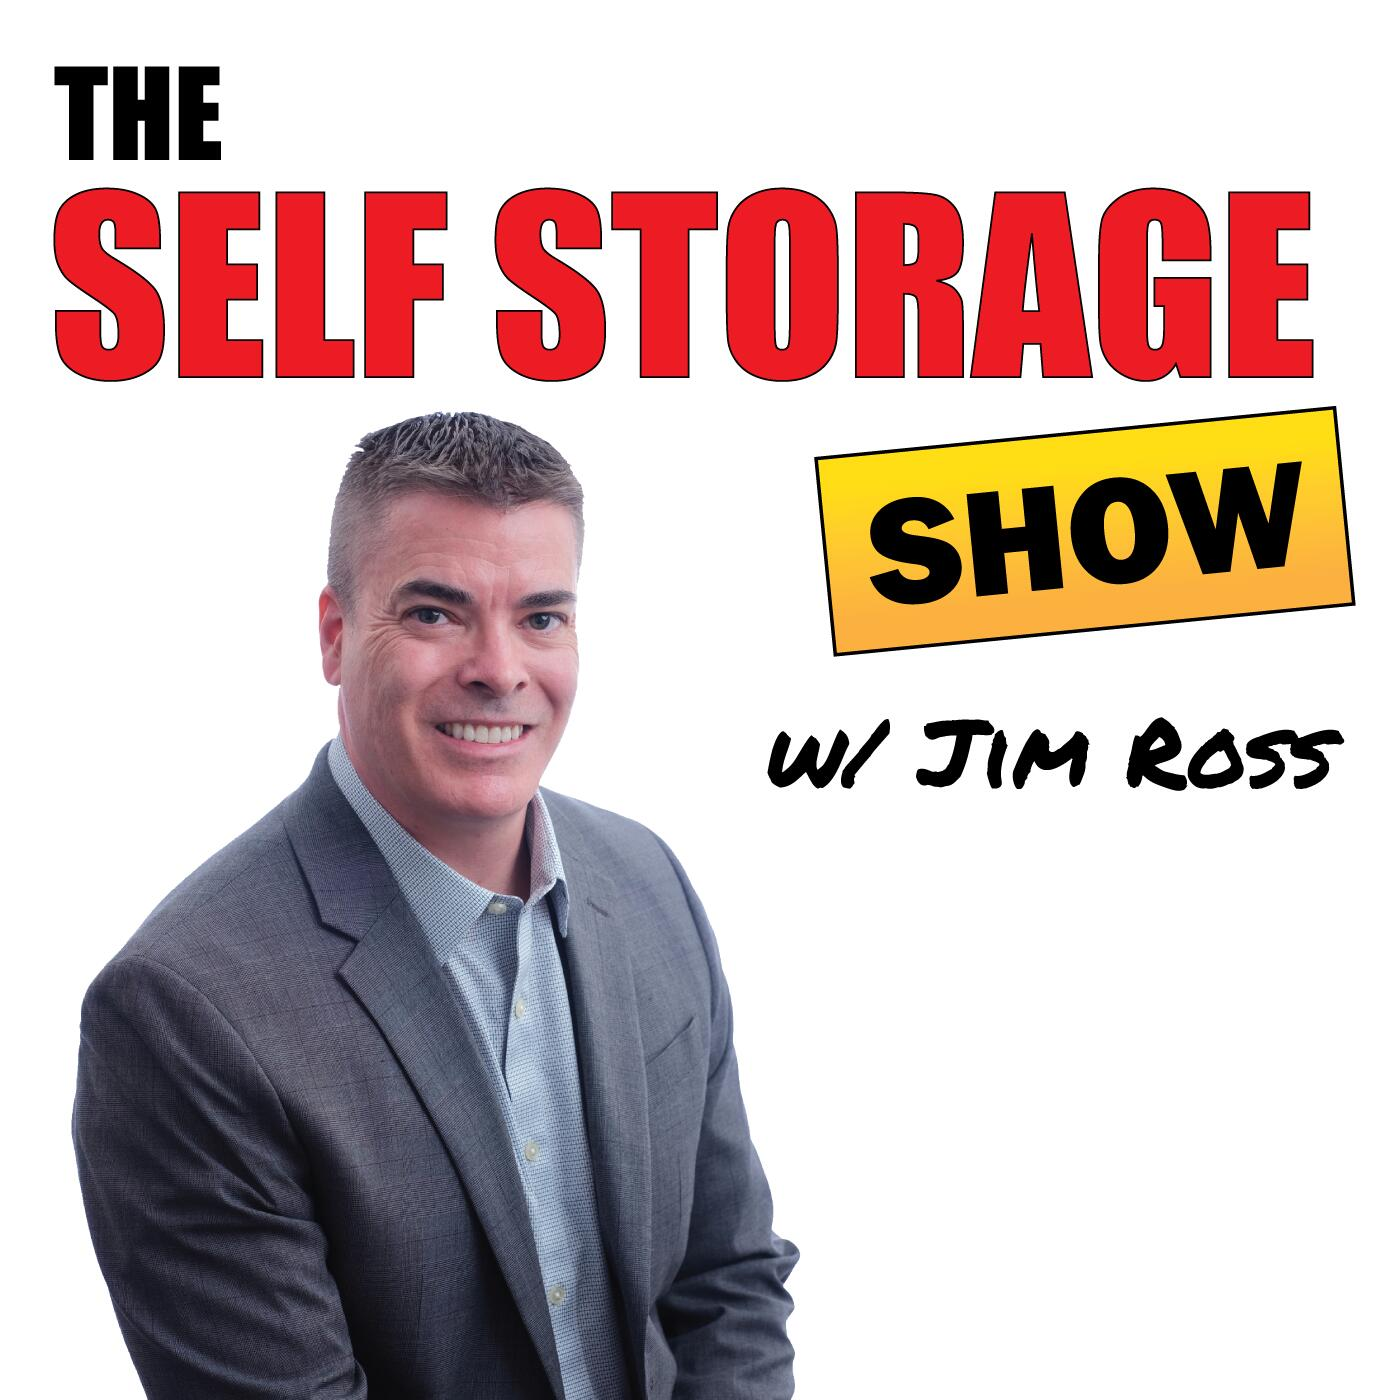 Listen to the The Self Storage Show Episode - 043: Storage